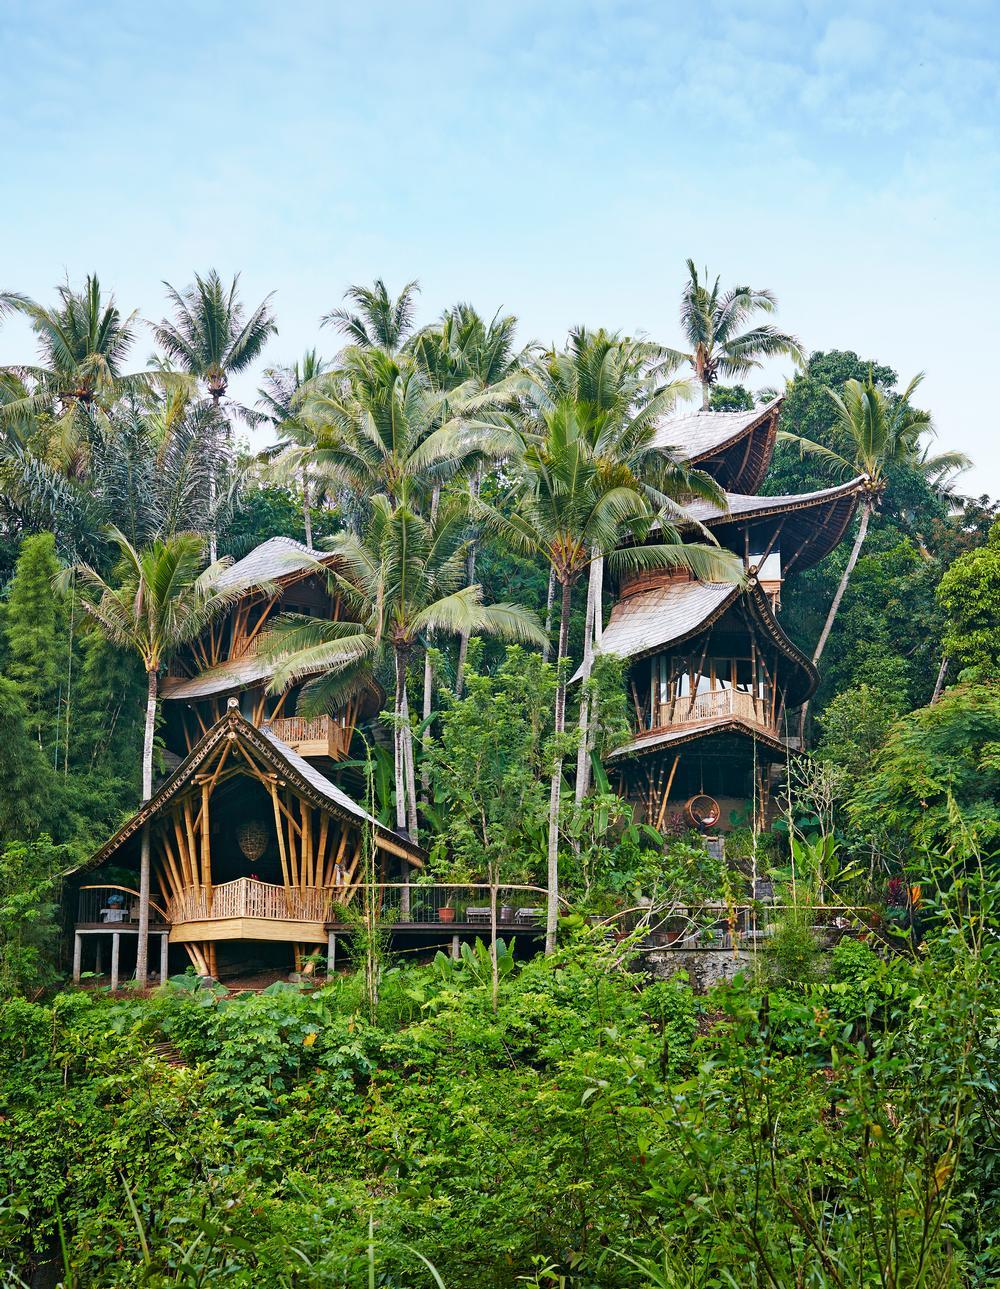 Ananda House at the Green Village, Bali is a magical and whimsical construction / Photo: IBUKU/Stephen Johnson